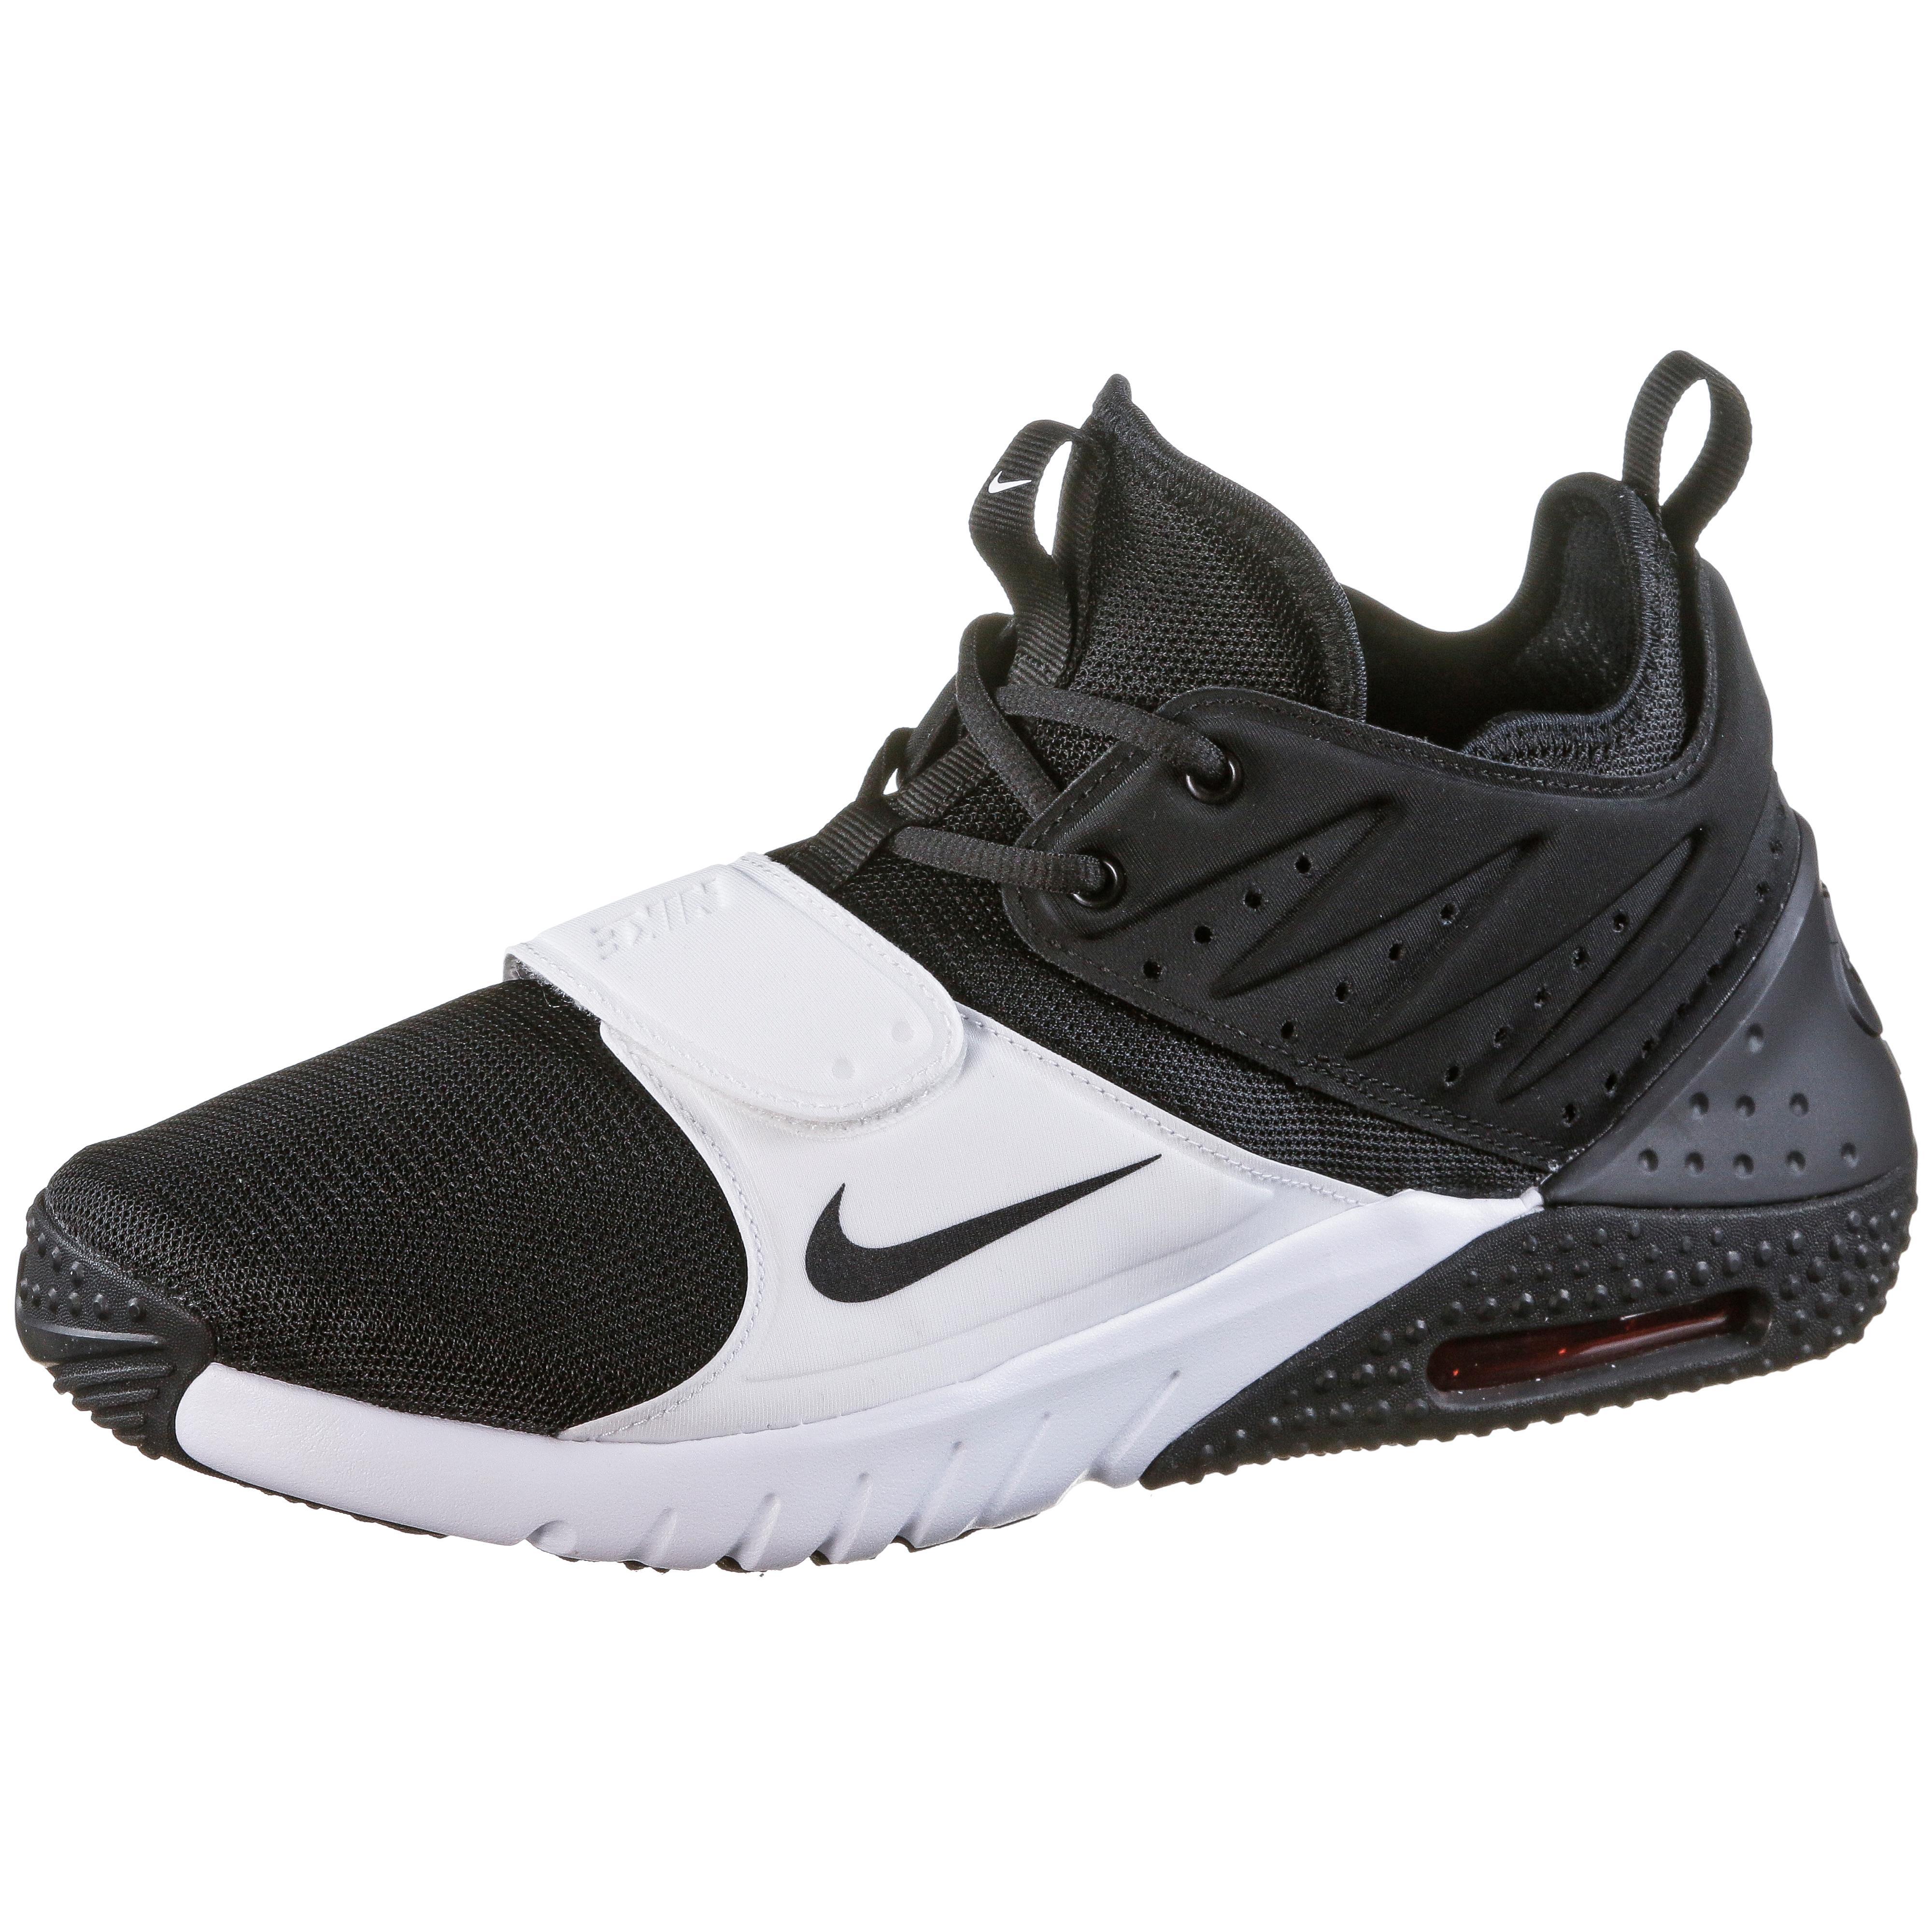 Black White Red Fitnessschuhe Trainer 2 Air Herren Im Blaze Max Nike HfY0qwq